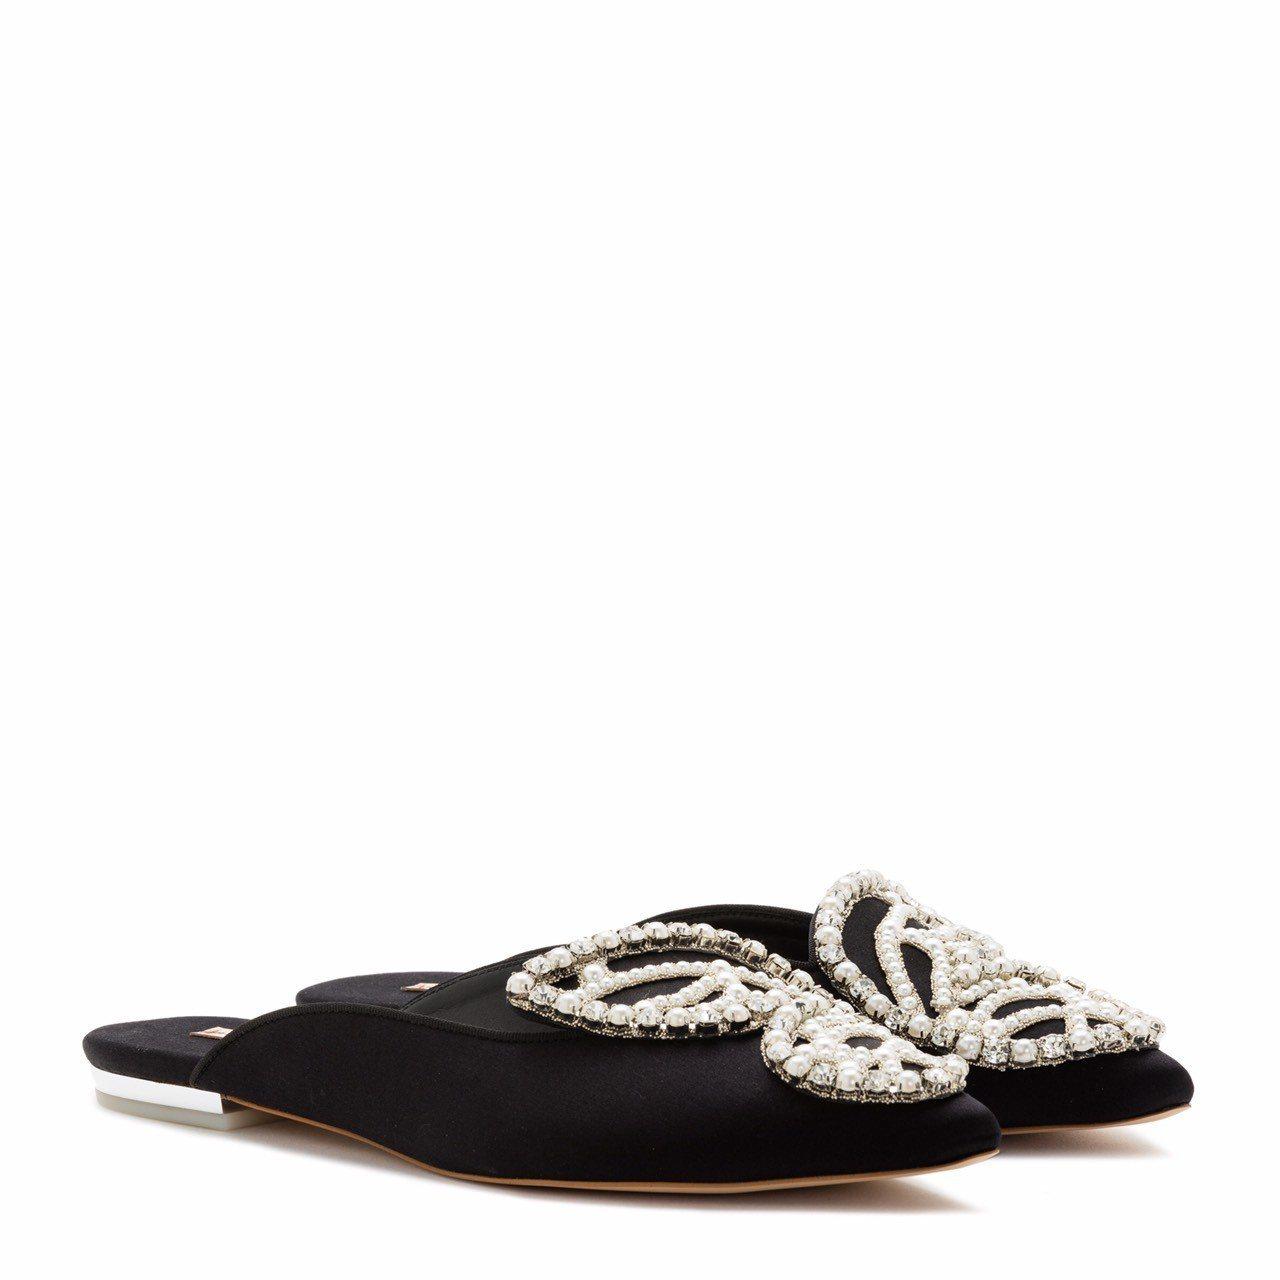 Sophie Webster奢華穆勒鞋。圖/初衣食午提供